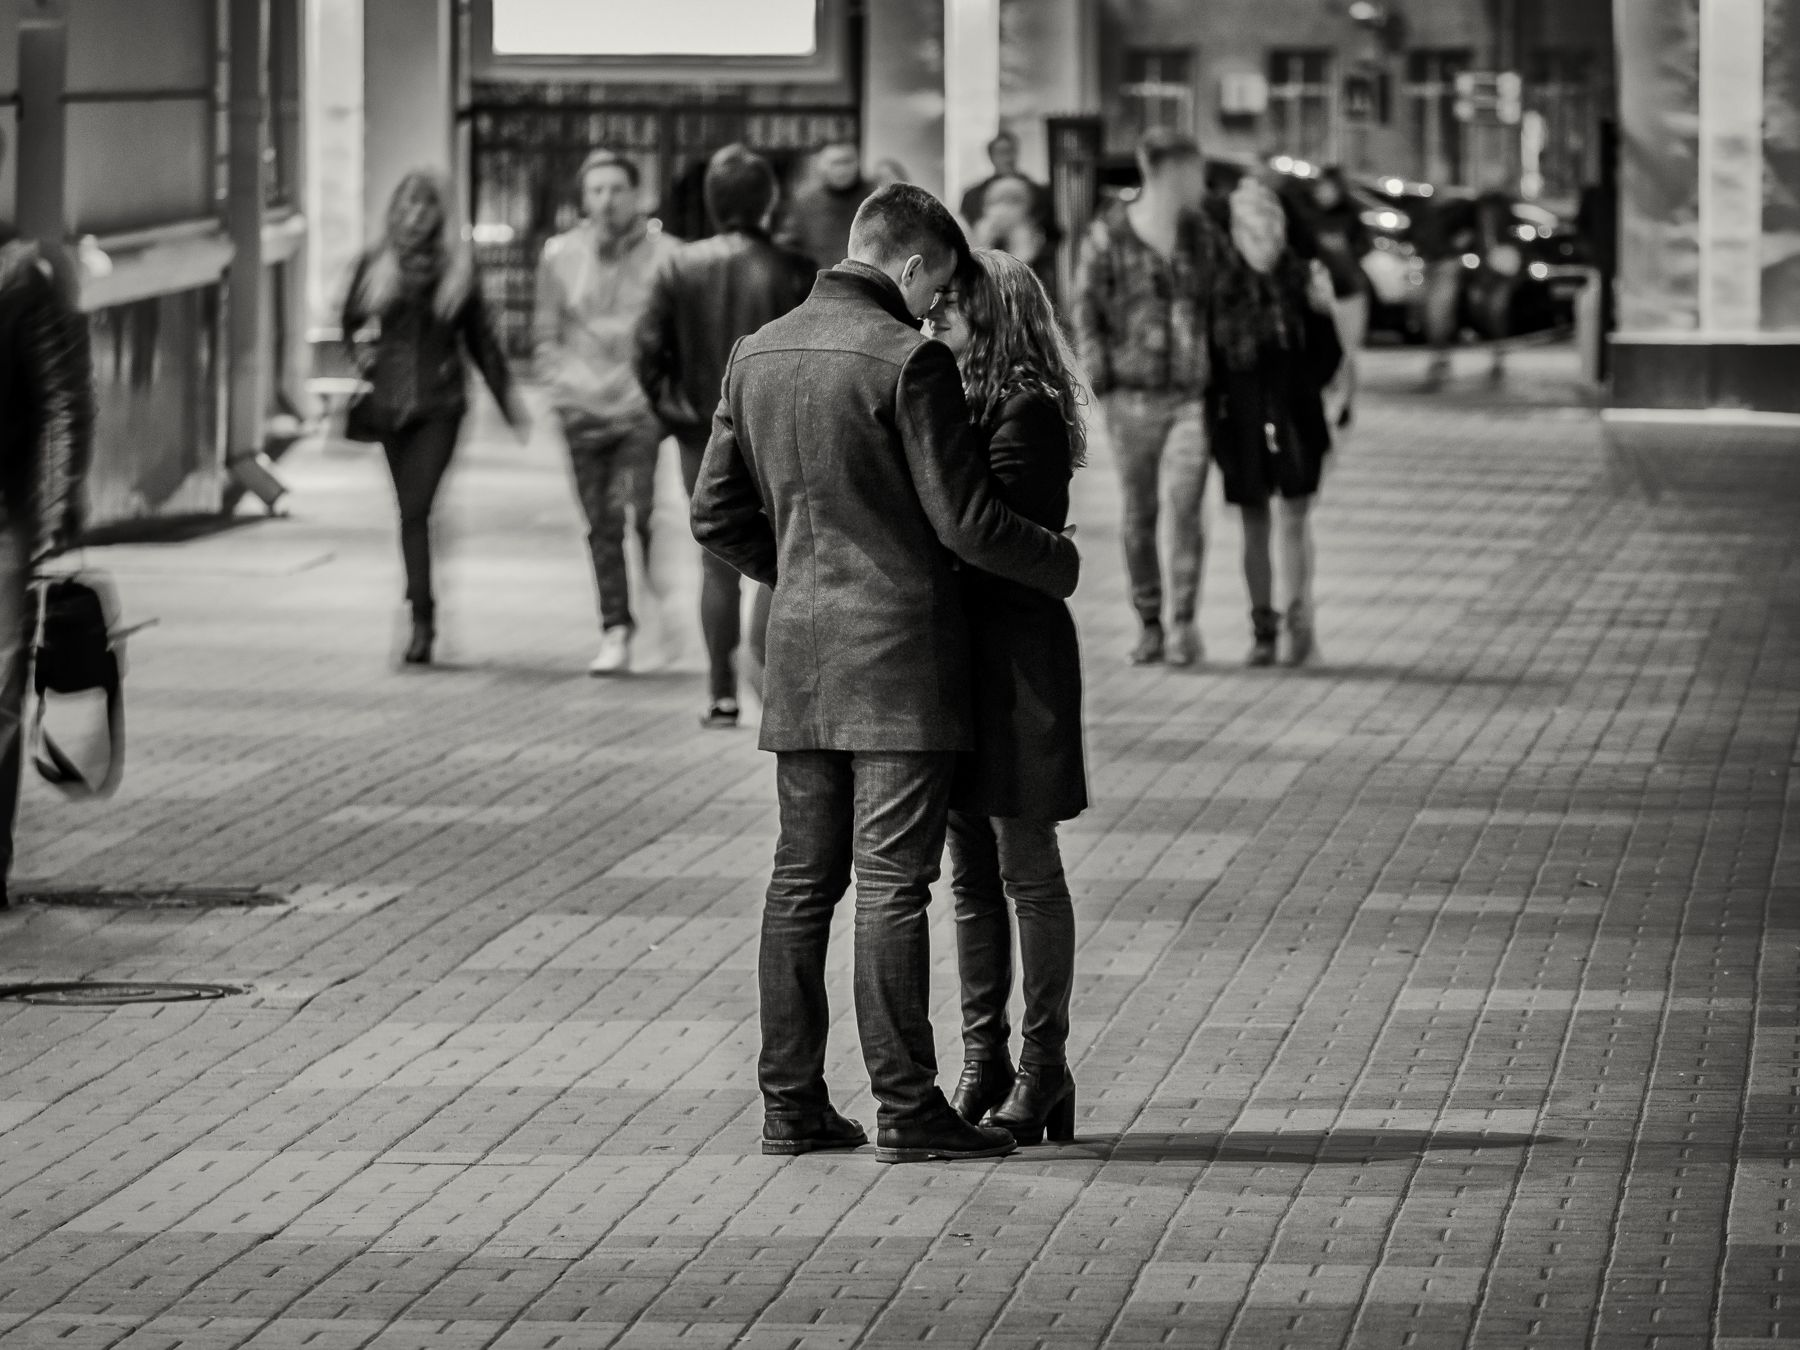 Жанр, стрит, улица, люди, любовь, чувства, Шишкин Марк